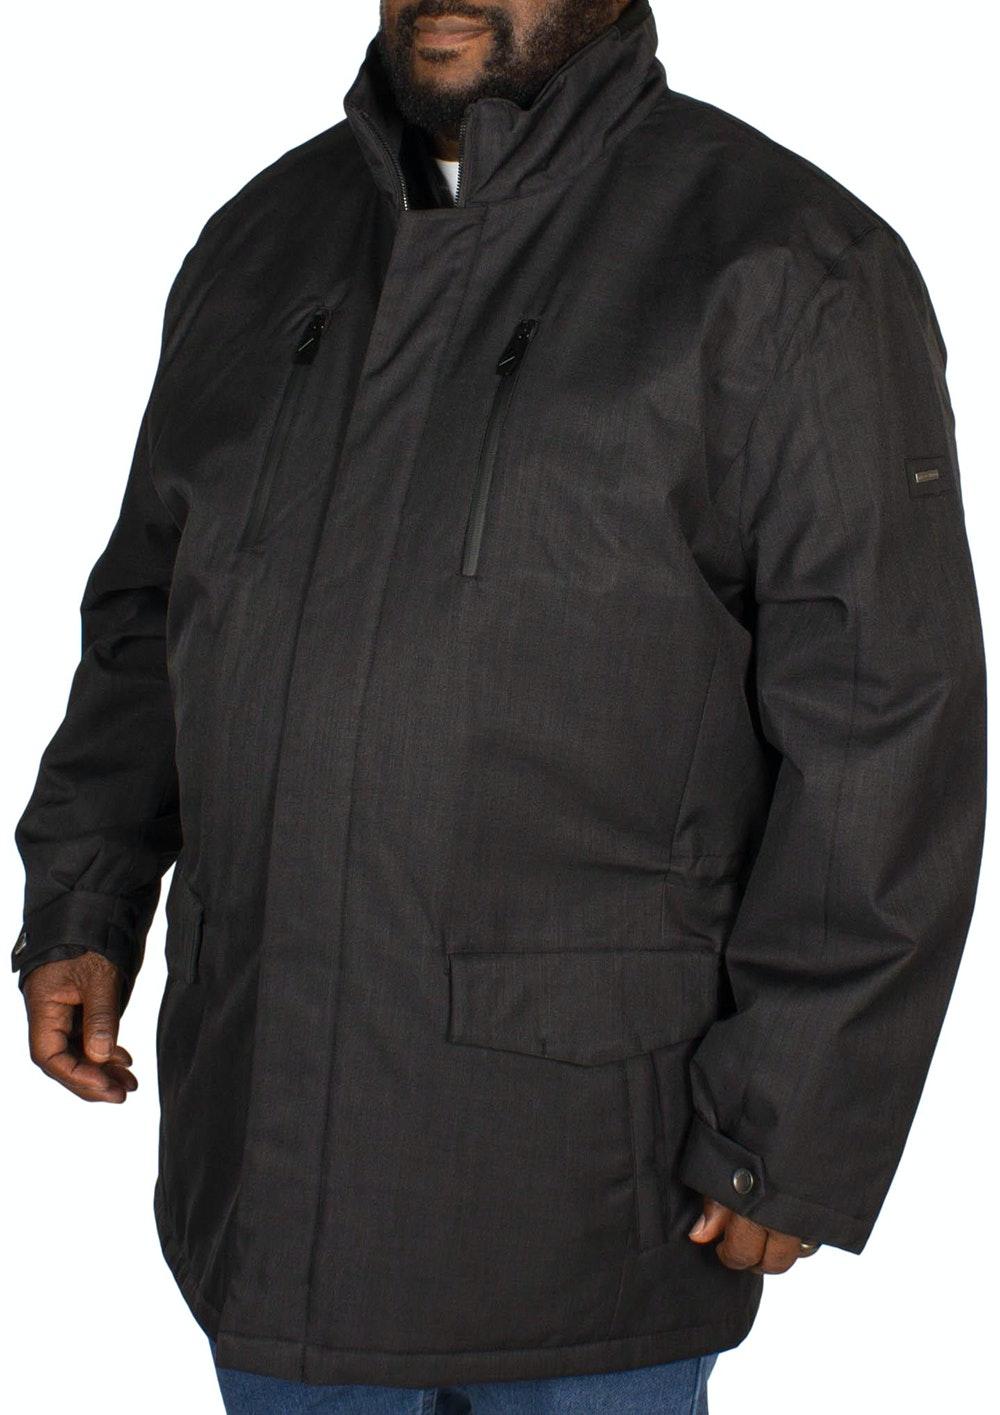 Erla of Sweden Padded Coat Black